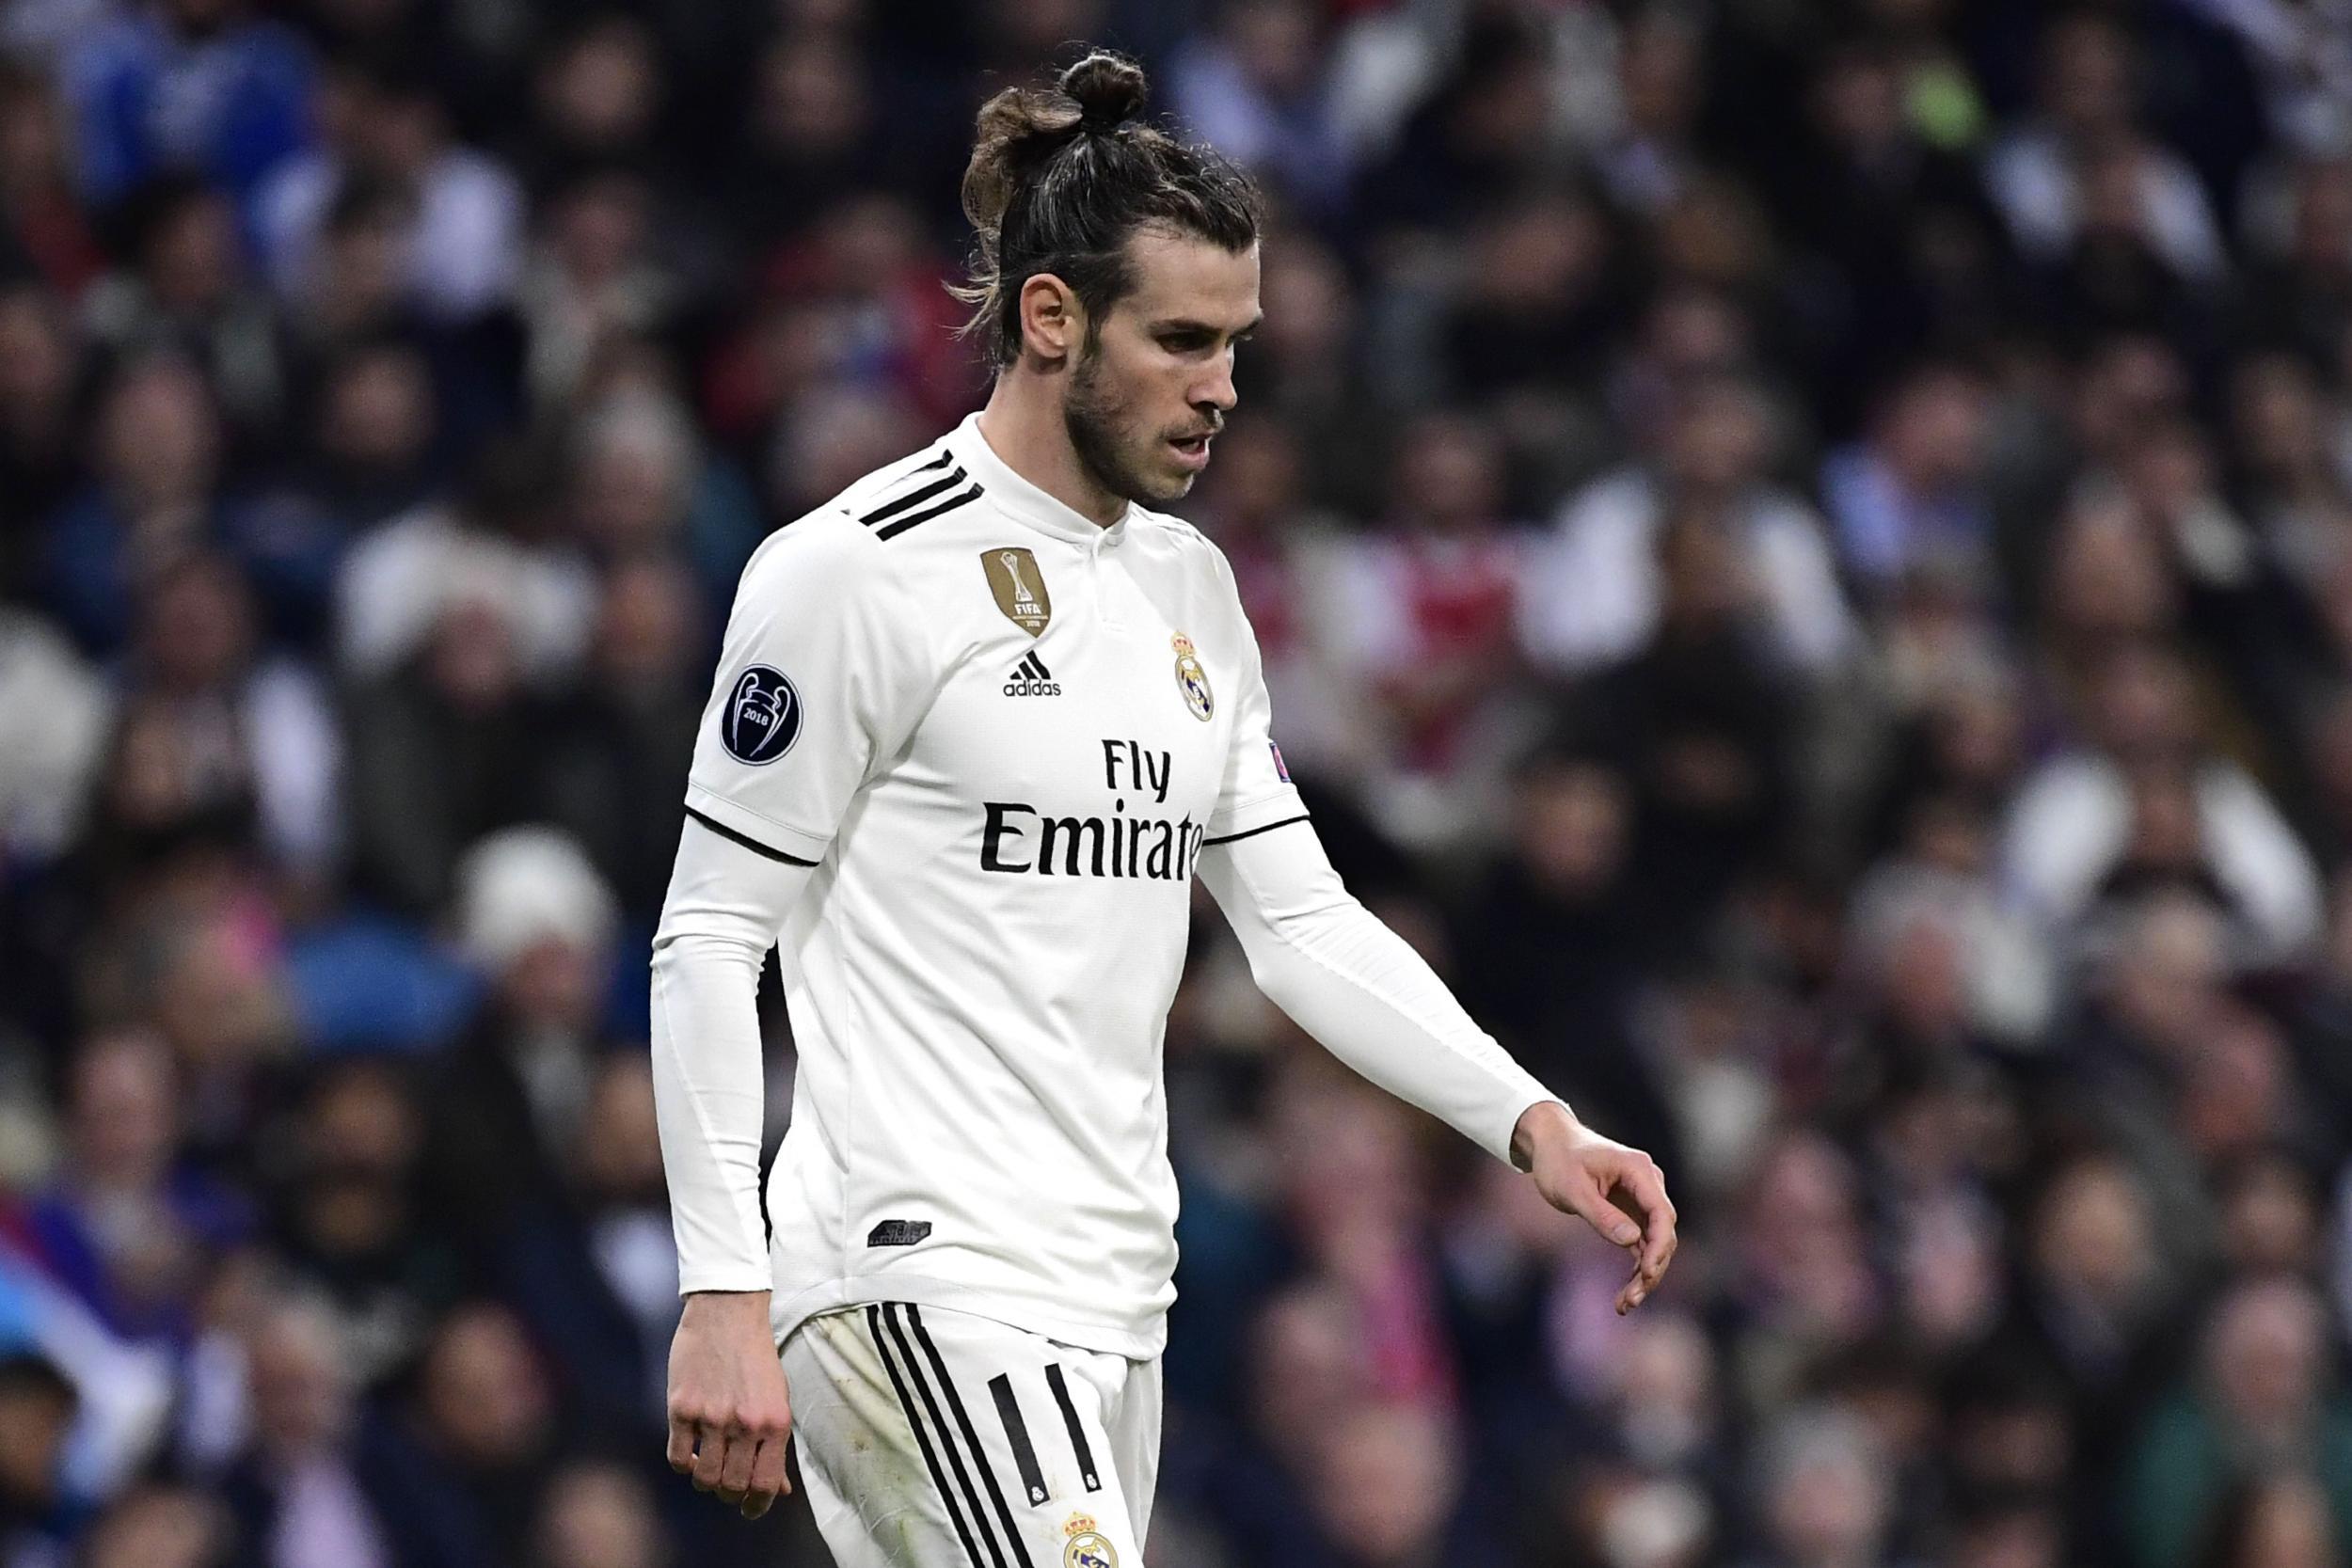 Bale Akan Putuskan Masa Depan di Akhir Musim